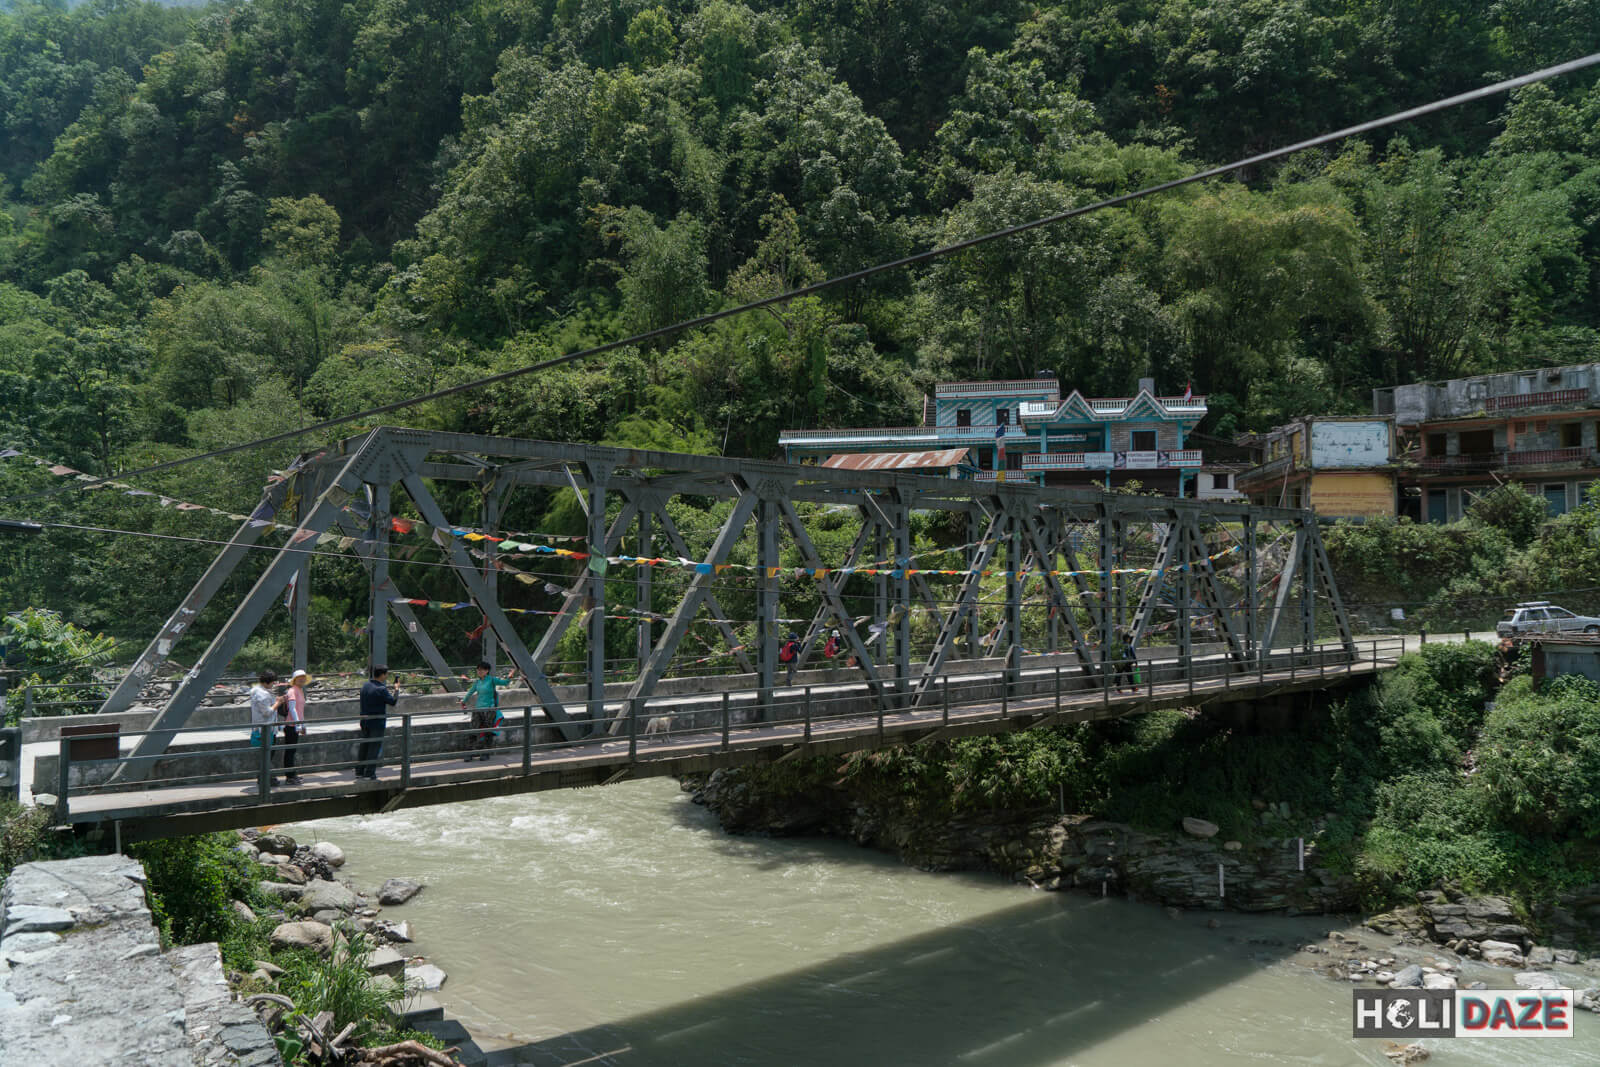 New Bridge over the Modi River in Birethanti, part of the Annapurna Conservation Area of Nepal